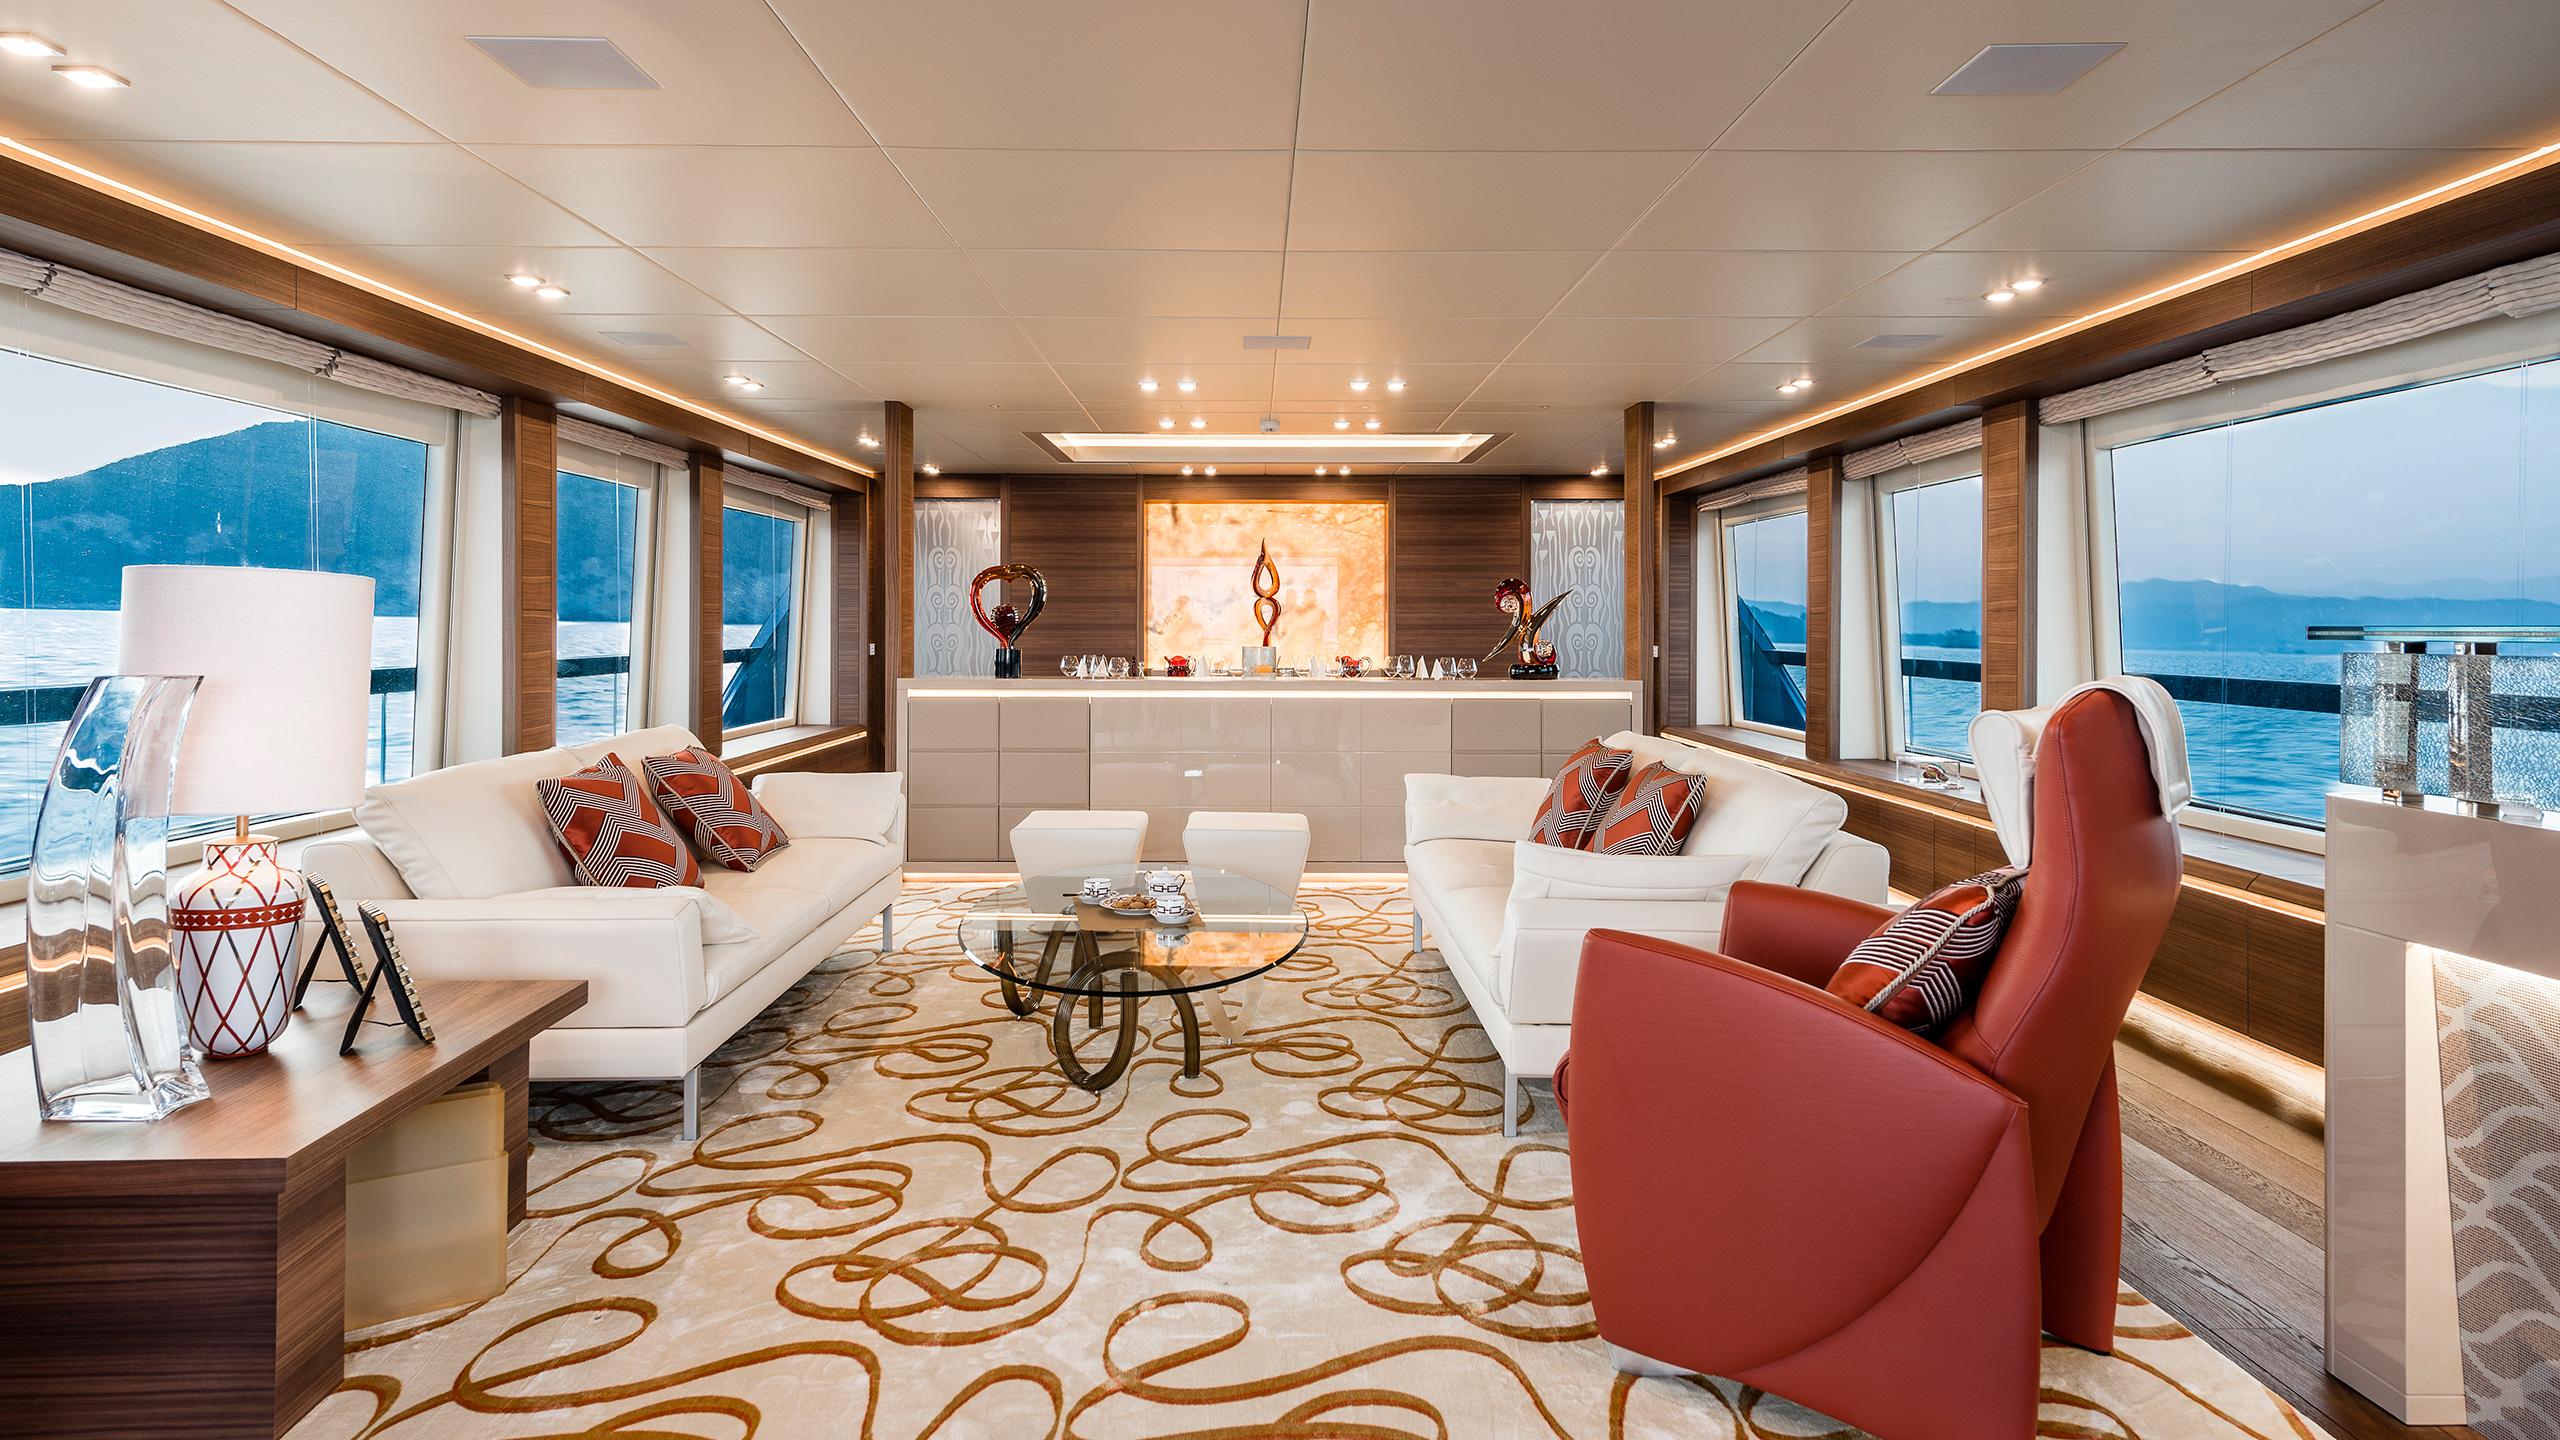 the-saloon-of-the-maiora-36-yacht-harmony